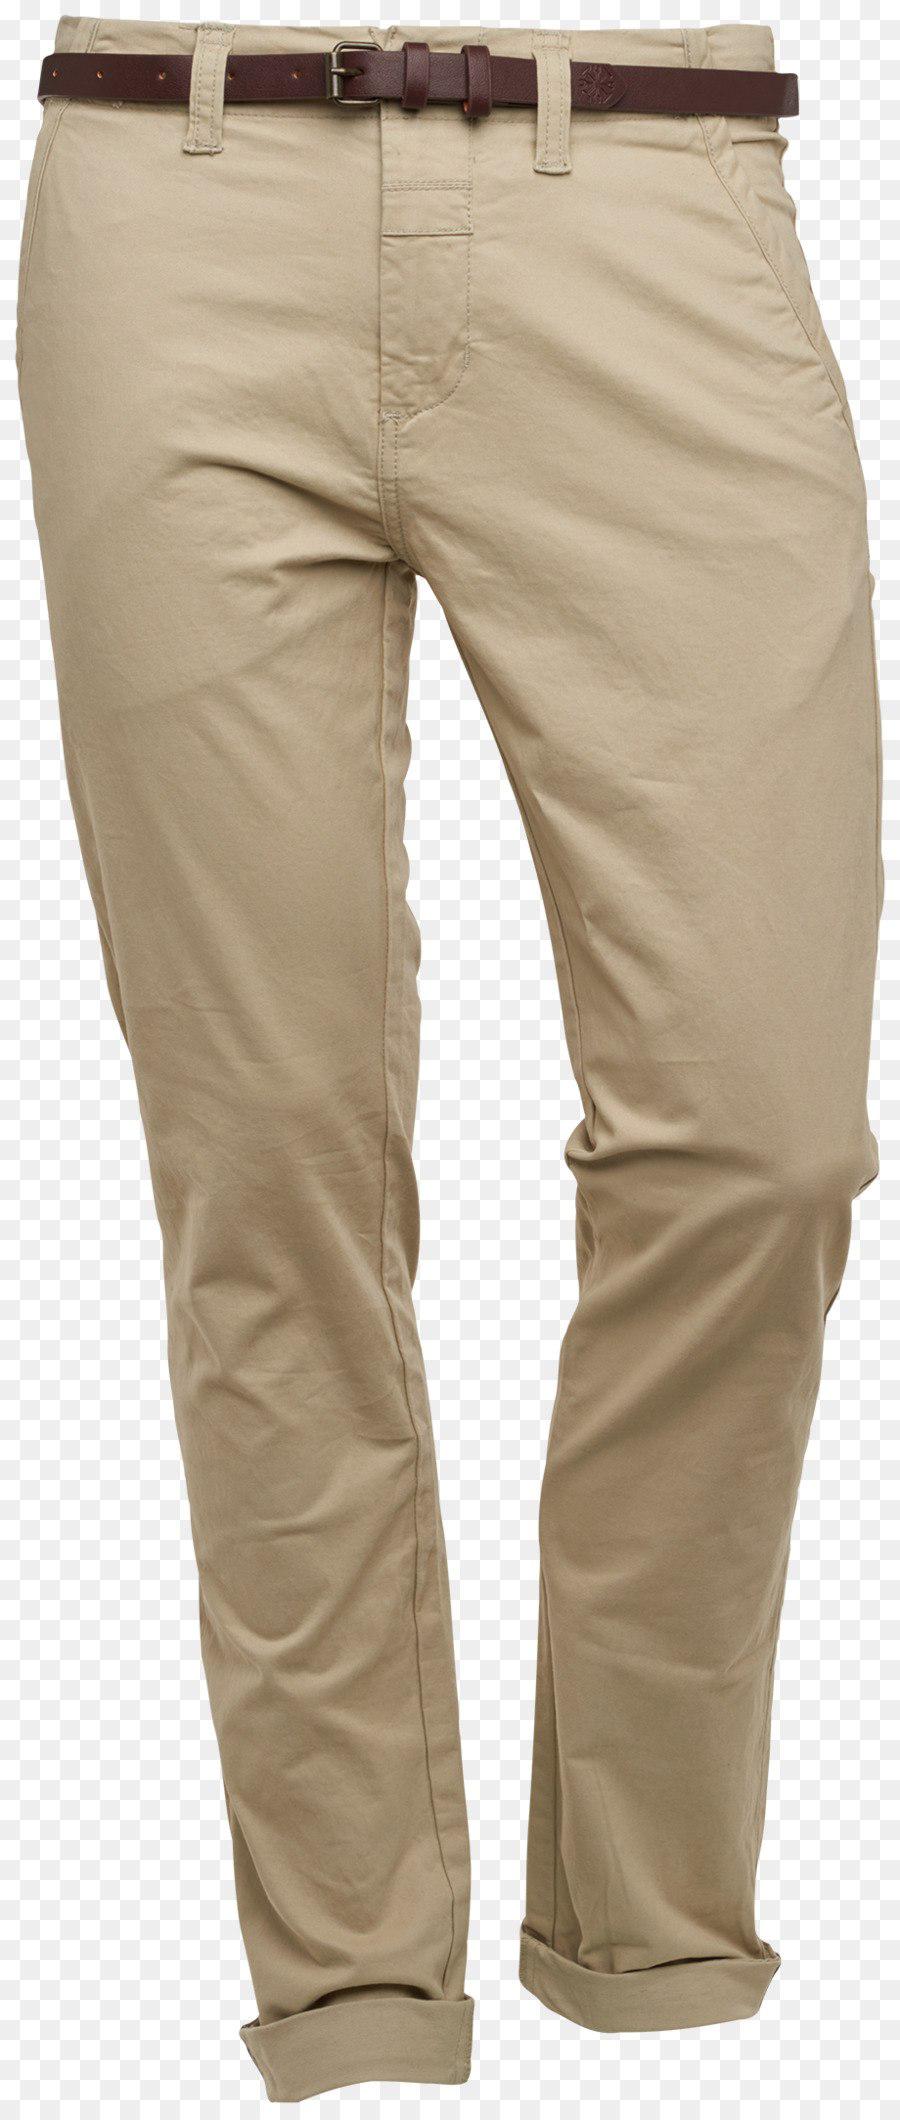 Khaki Pant PNG Free Download SVG Clip arts